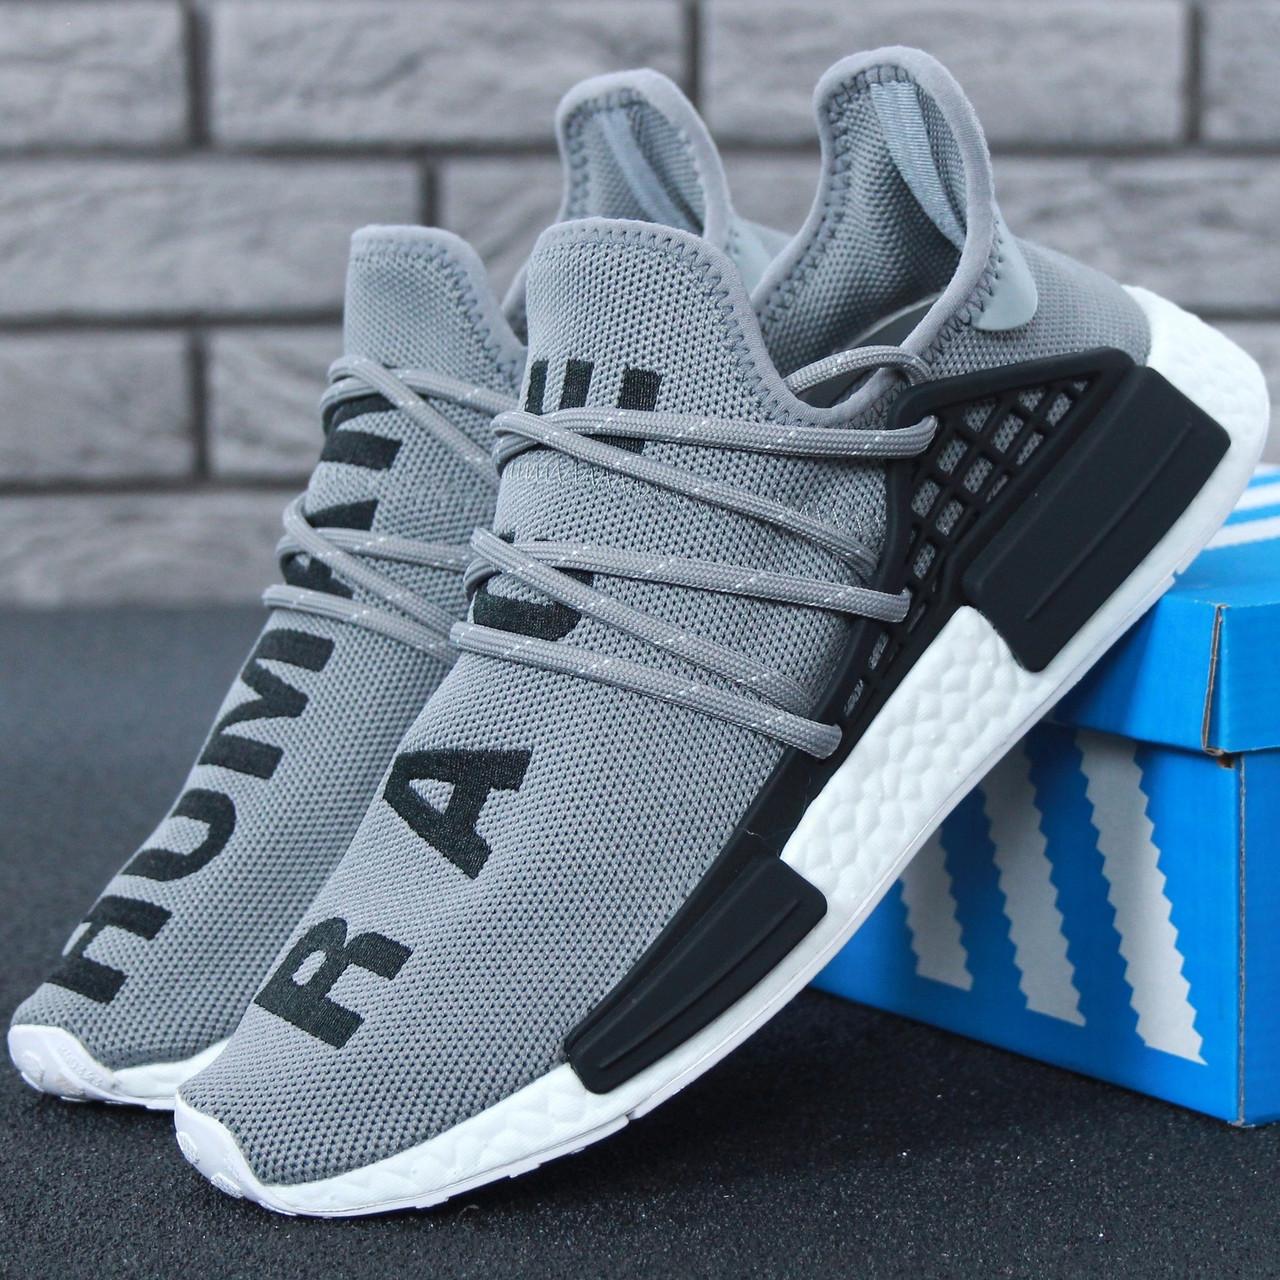 d5164686624d40 Мужские кроссовки Adidas NMD Human Race x Pharrell Williams Grey/Black/White  - Интернет